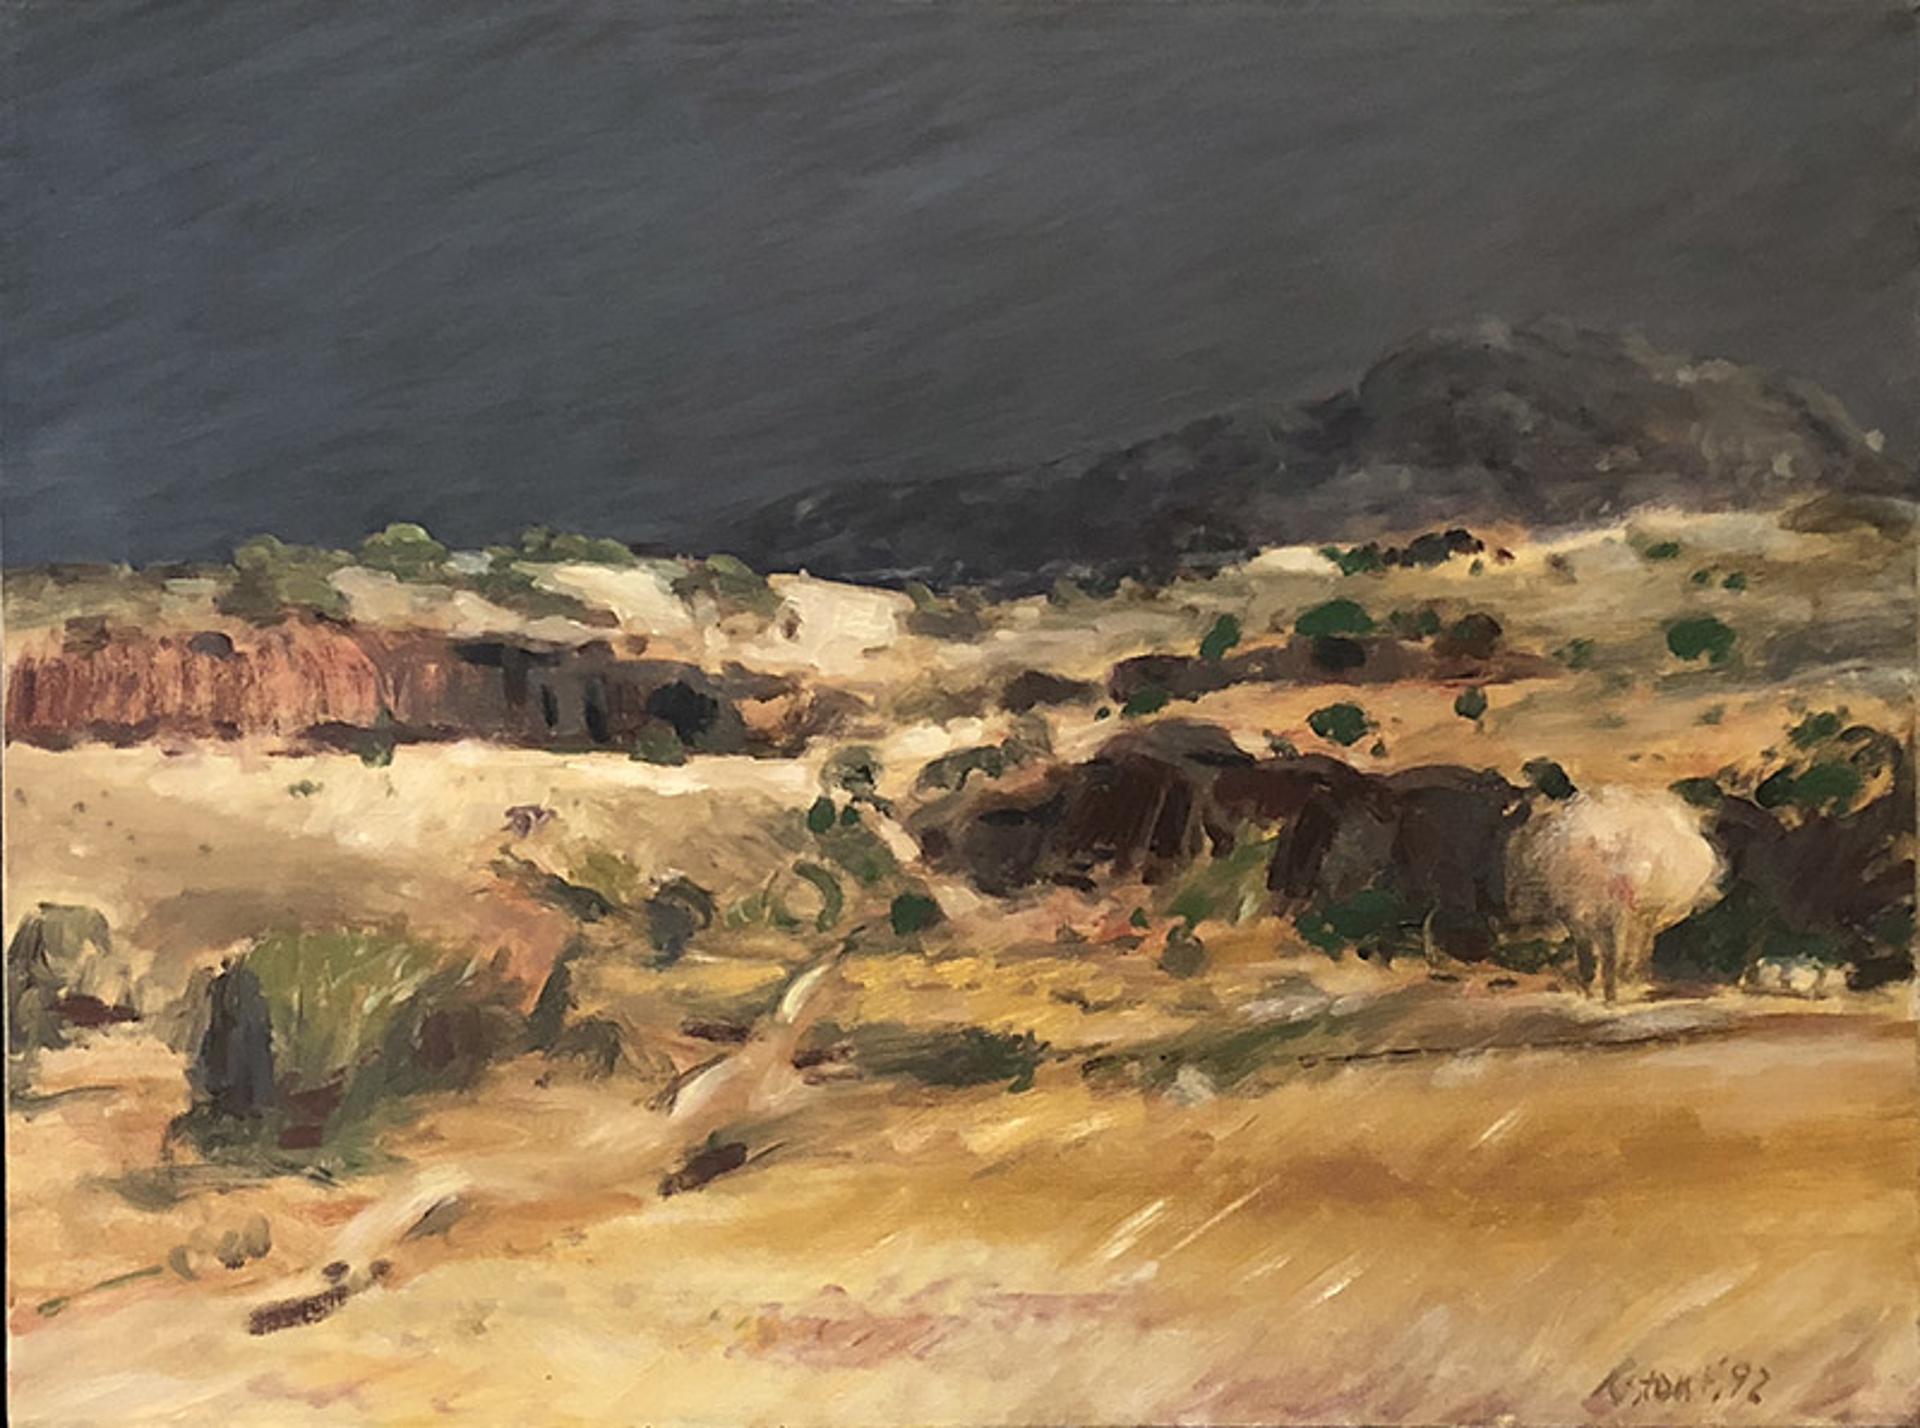 Untitled, Big Bend by Richard Stout